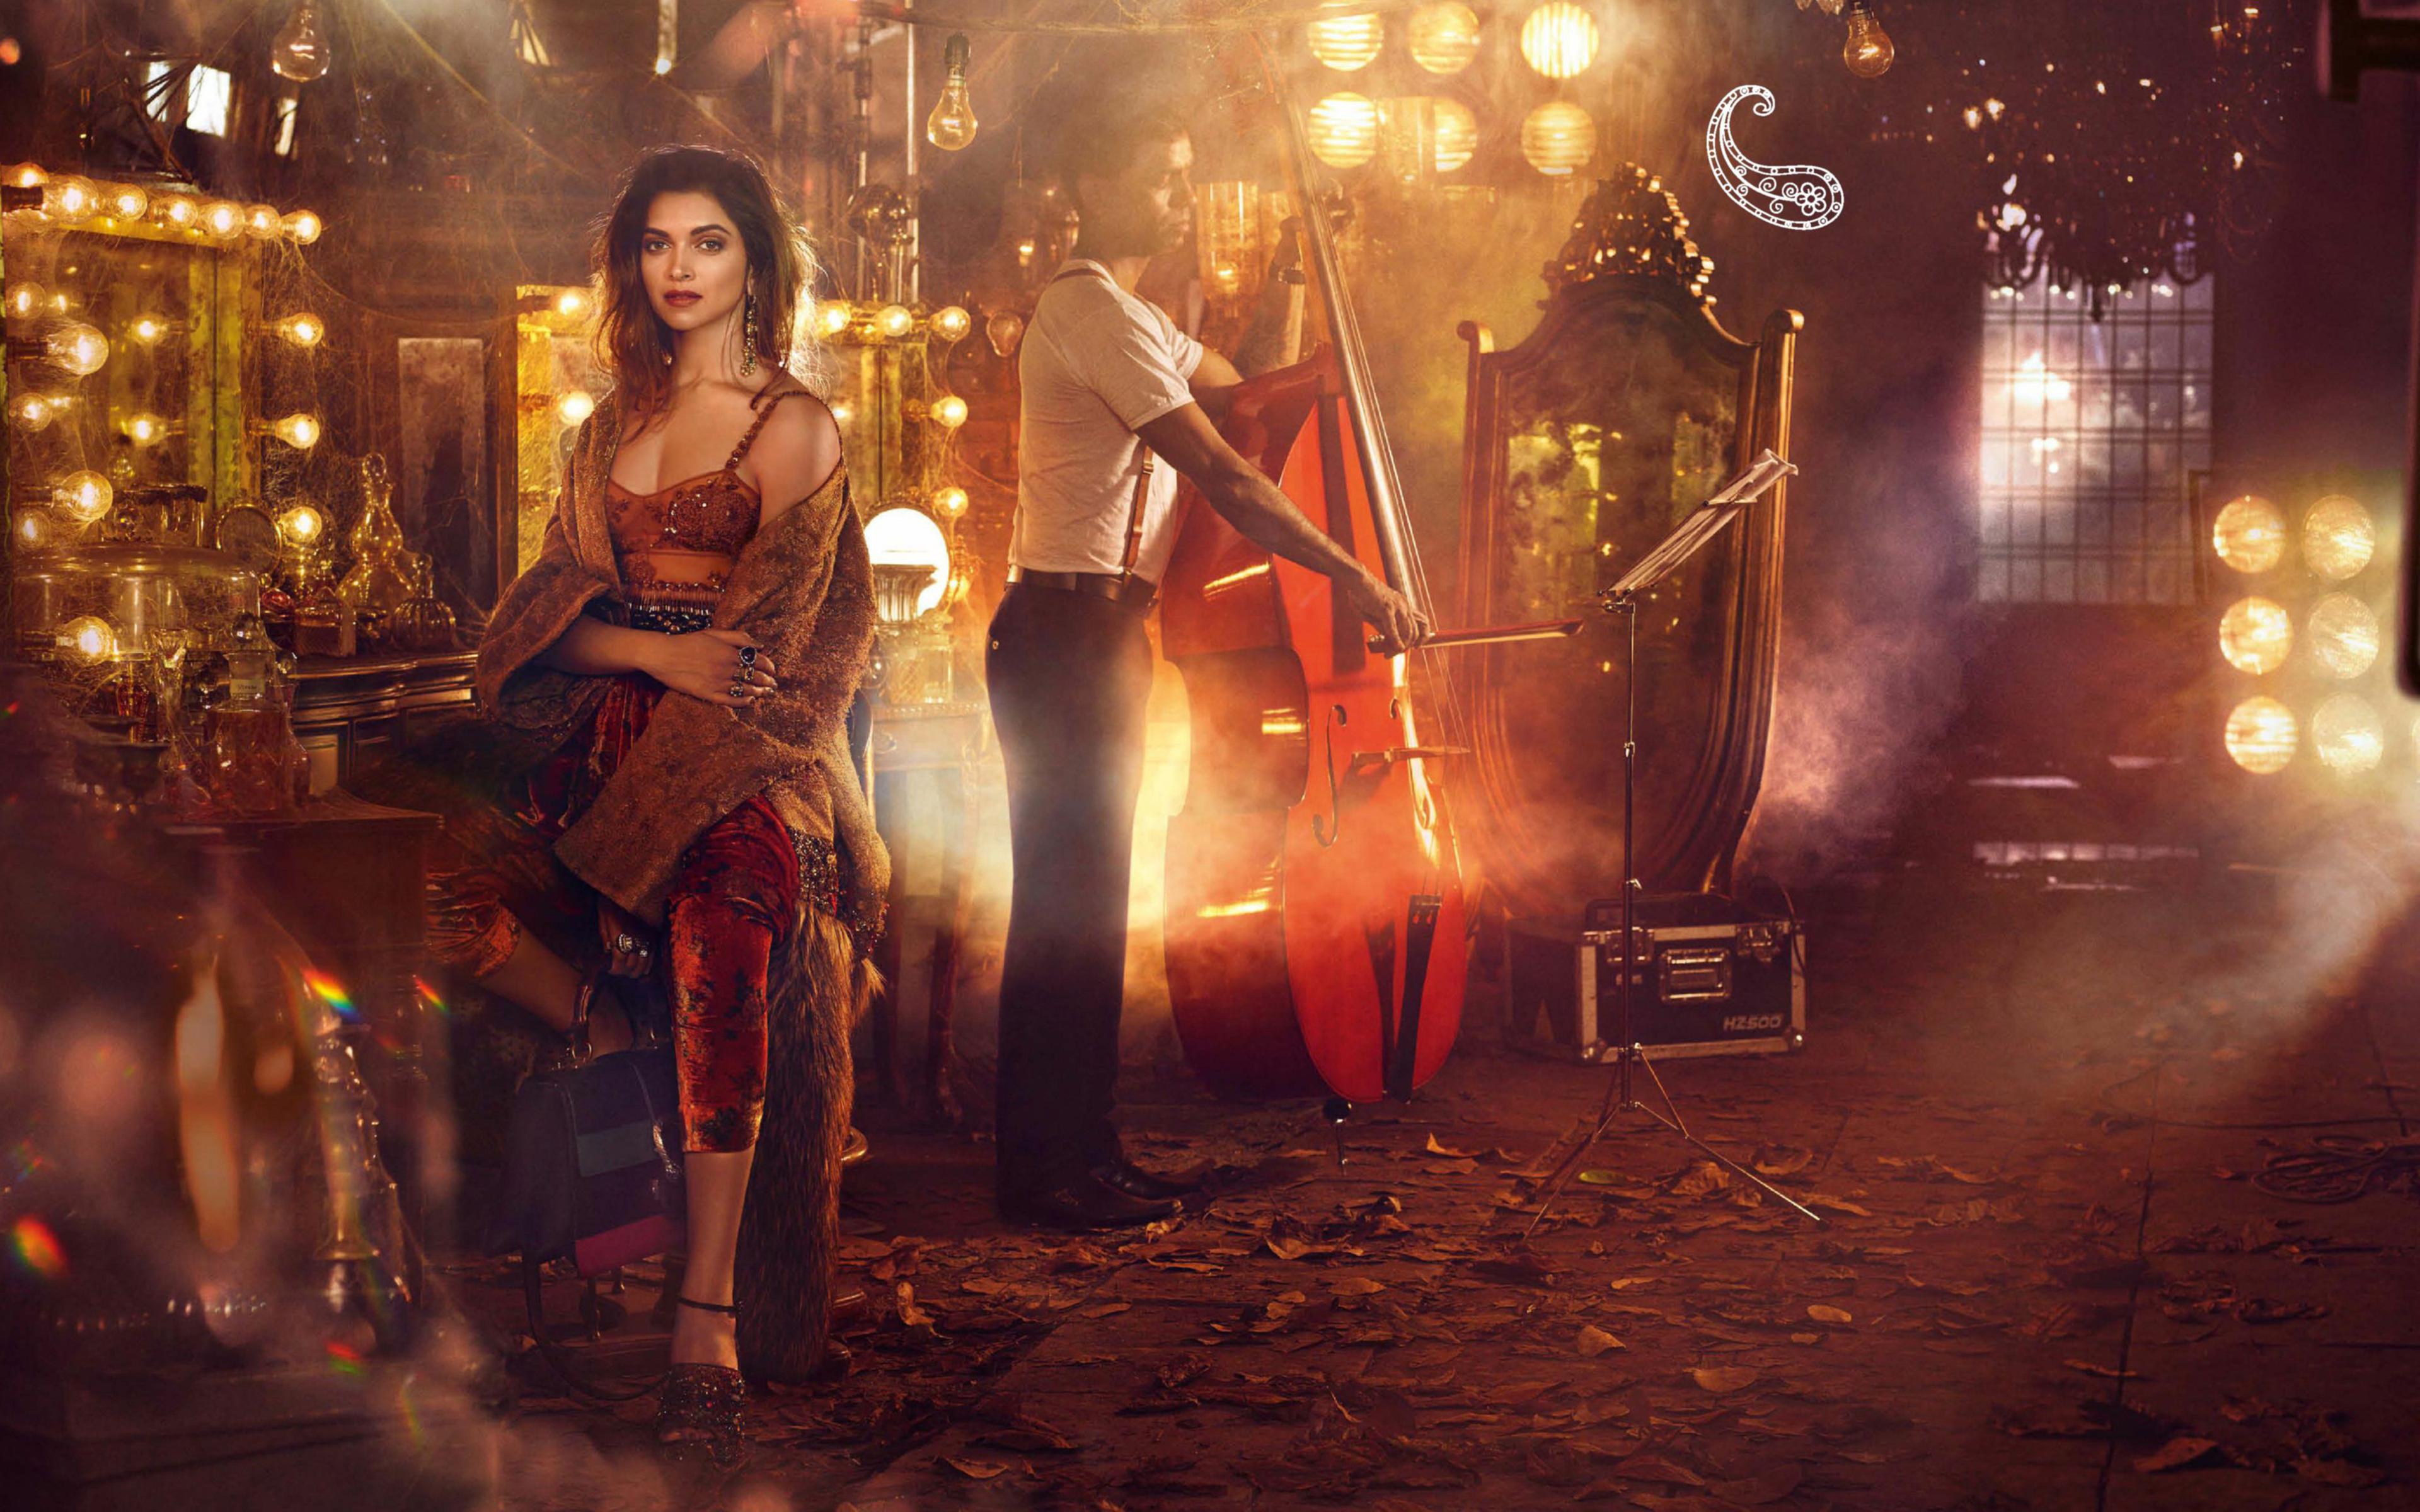 Deepika Padukone Vogue Photoshoot 2016, HD Indian